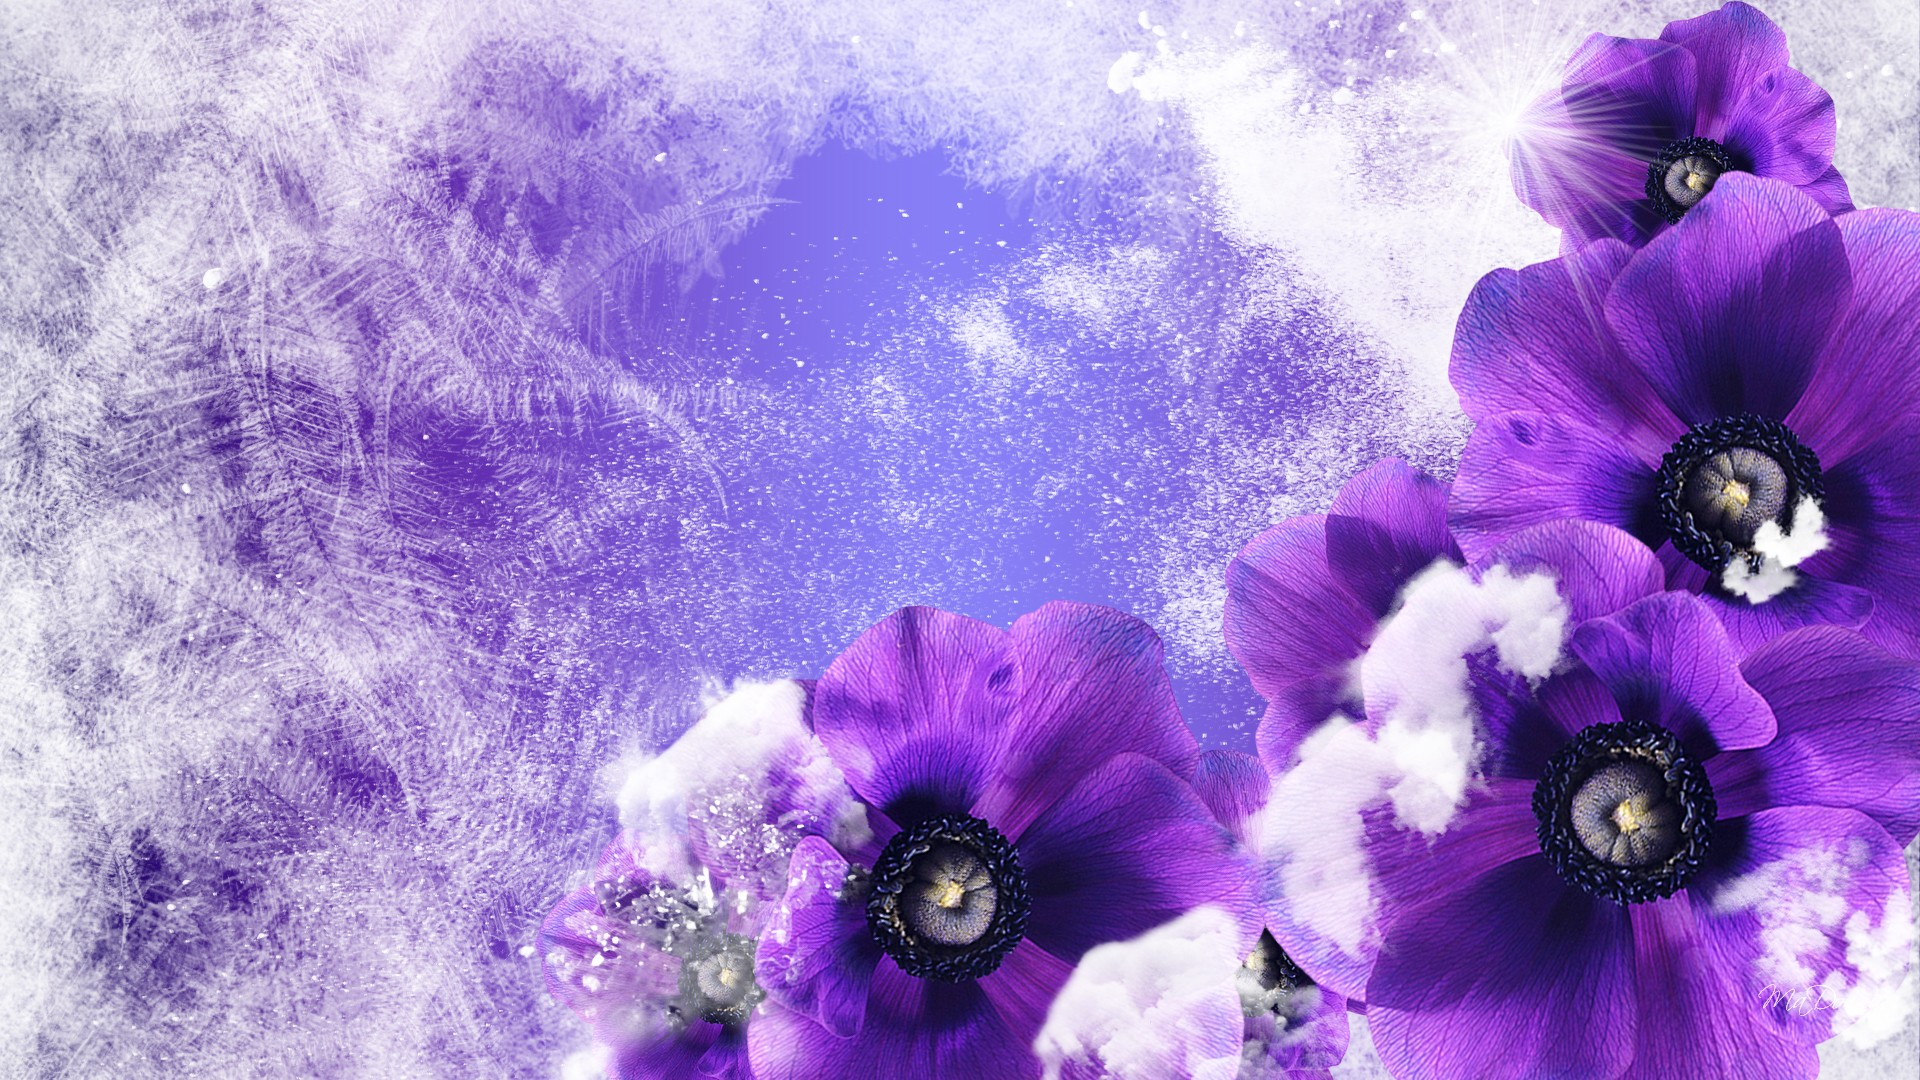 Winter Flowers px HDWallSource